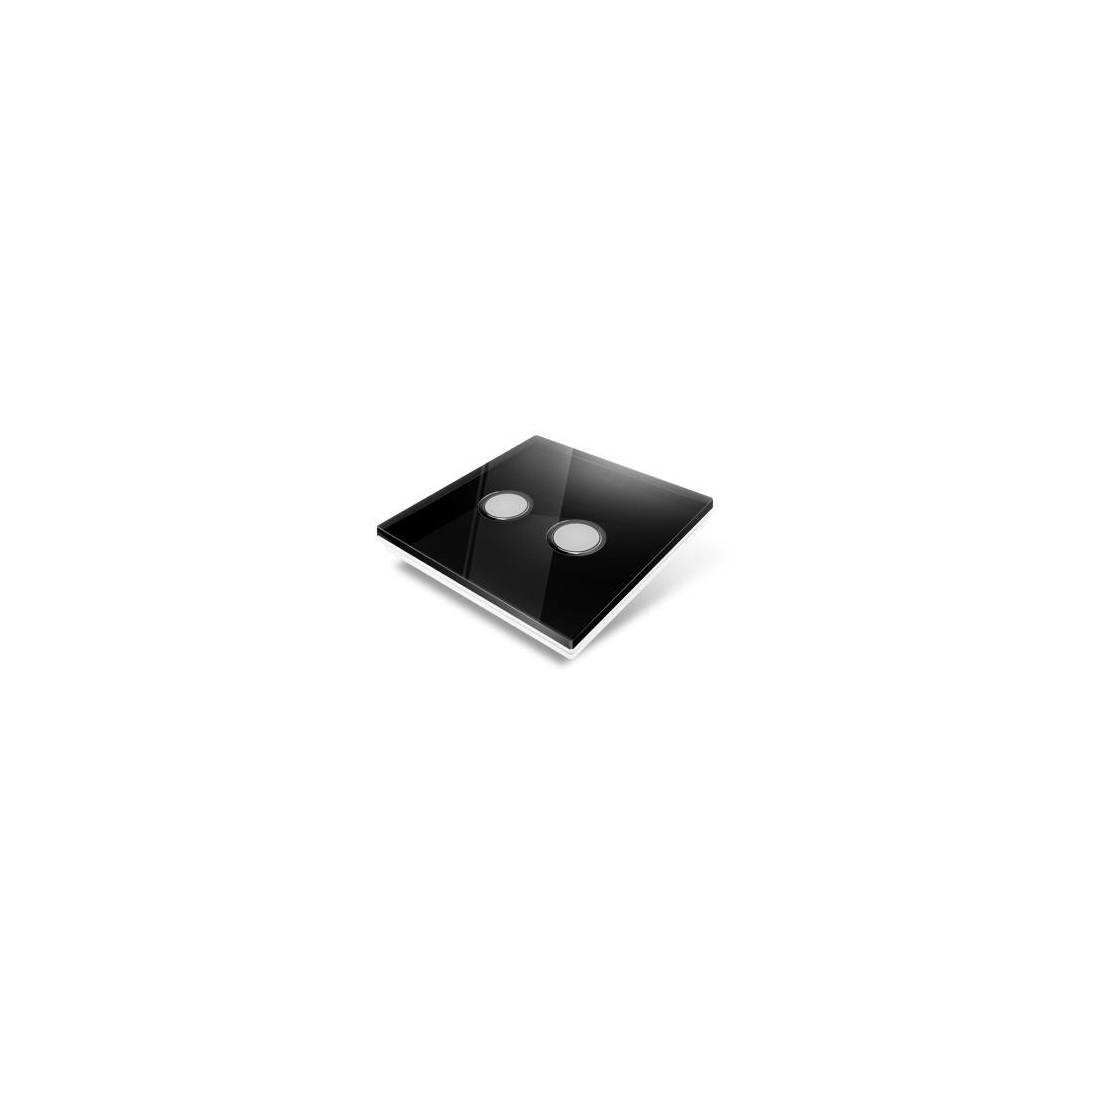 Switchplate for Edisio - black plastic